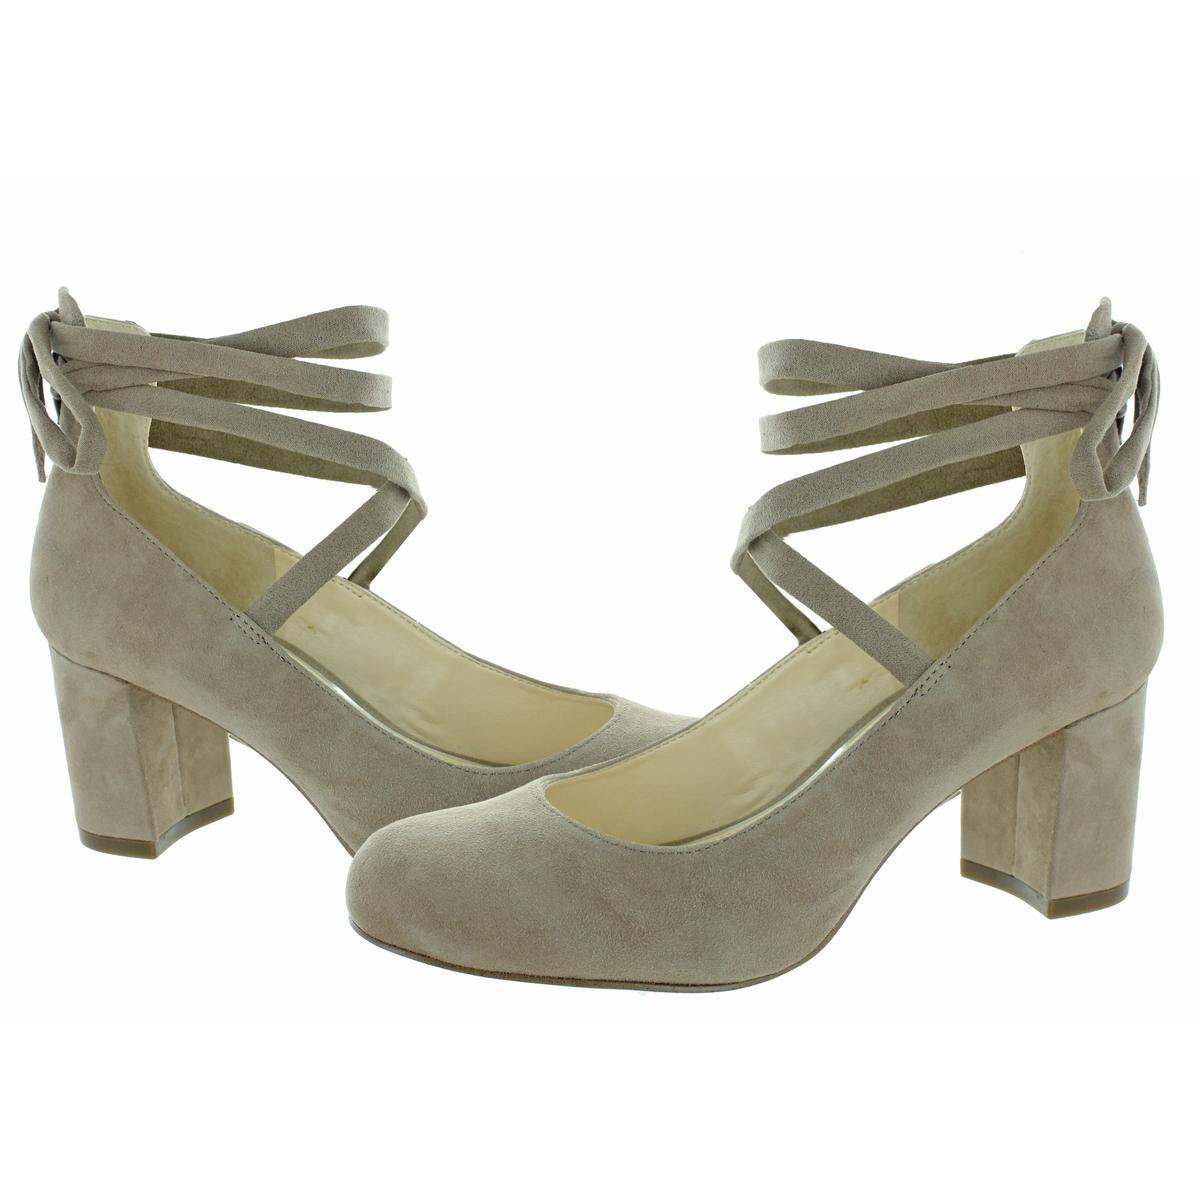 Jessica-Simpson-Venya-Women-039-s-Block-Heel-Lace-Pumps-Dress-Shoes thumbnail 6